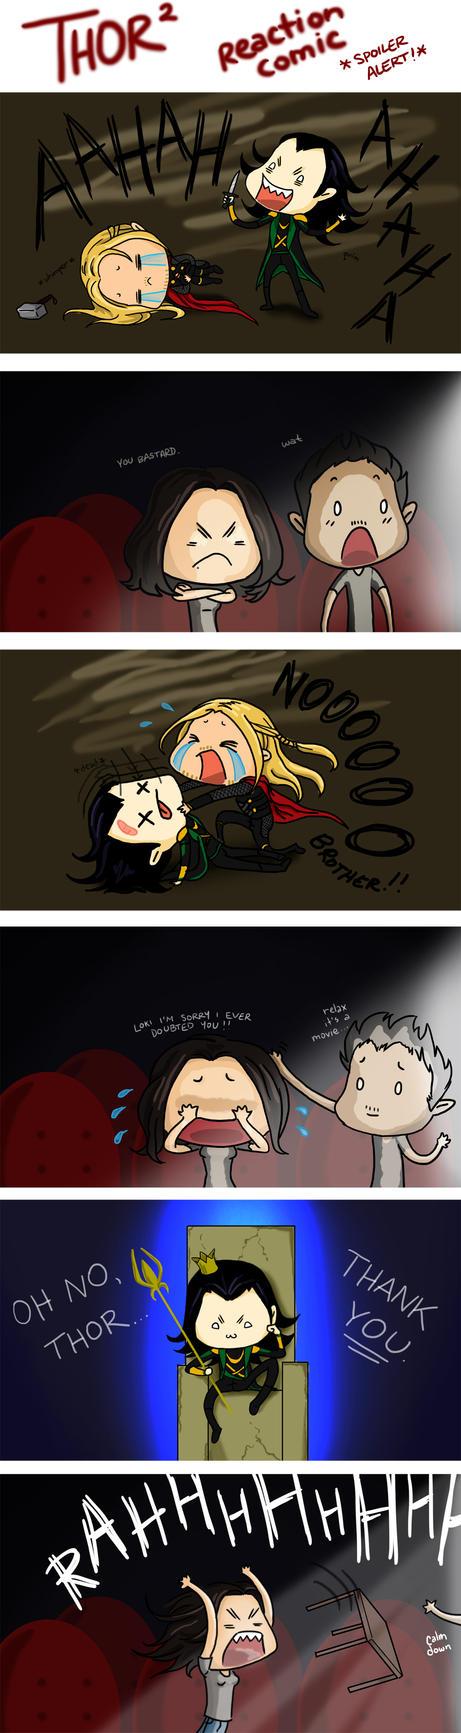 Thor 2 Reaction Comic **SPOILER ALERT!** by RAMENmanga-ka